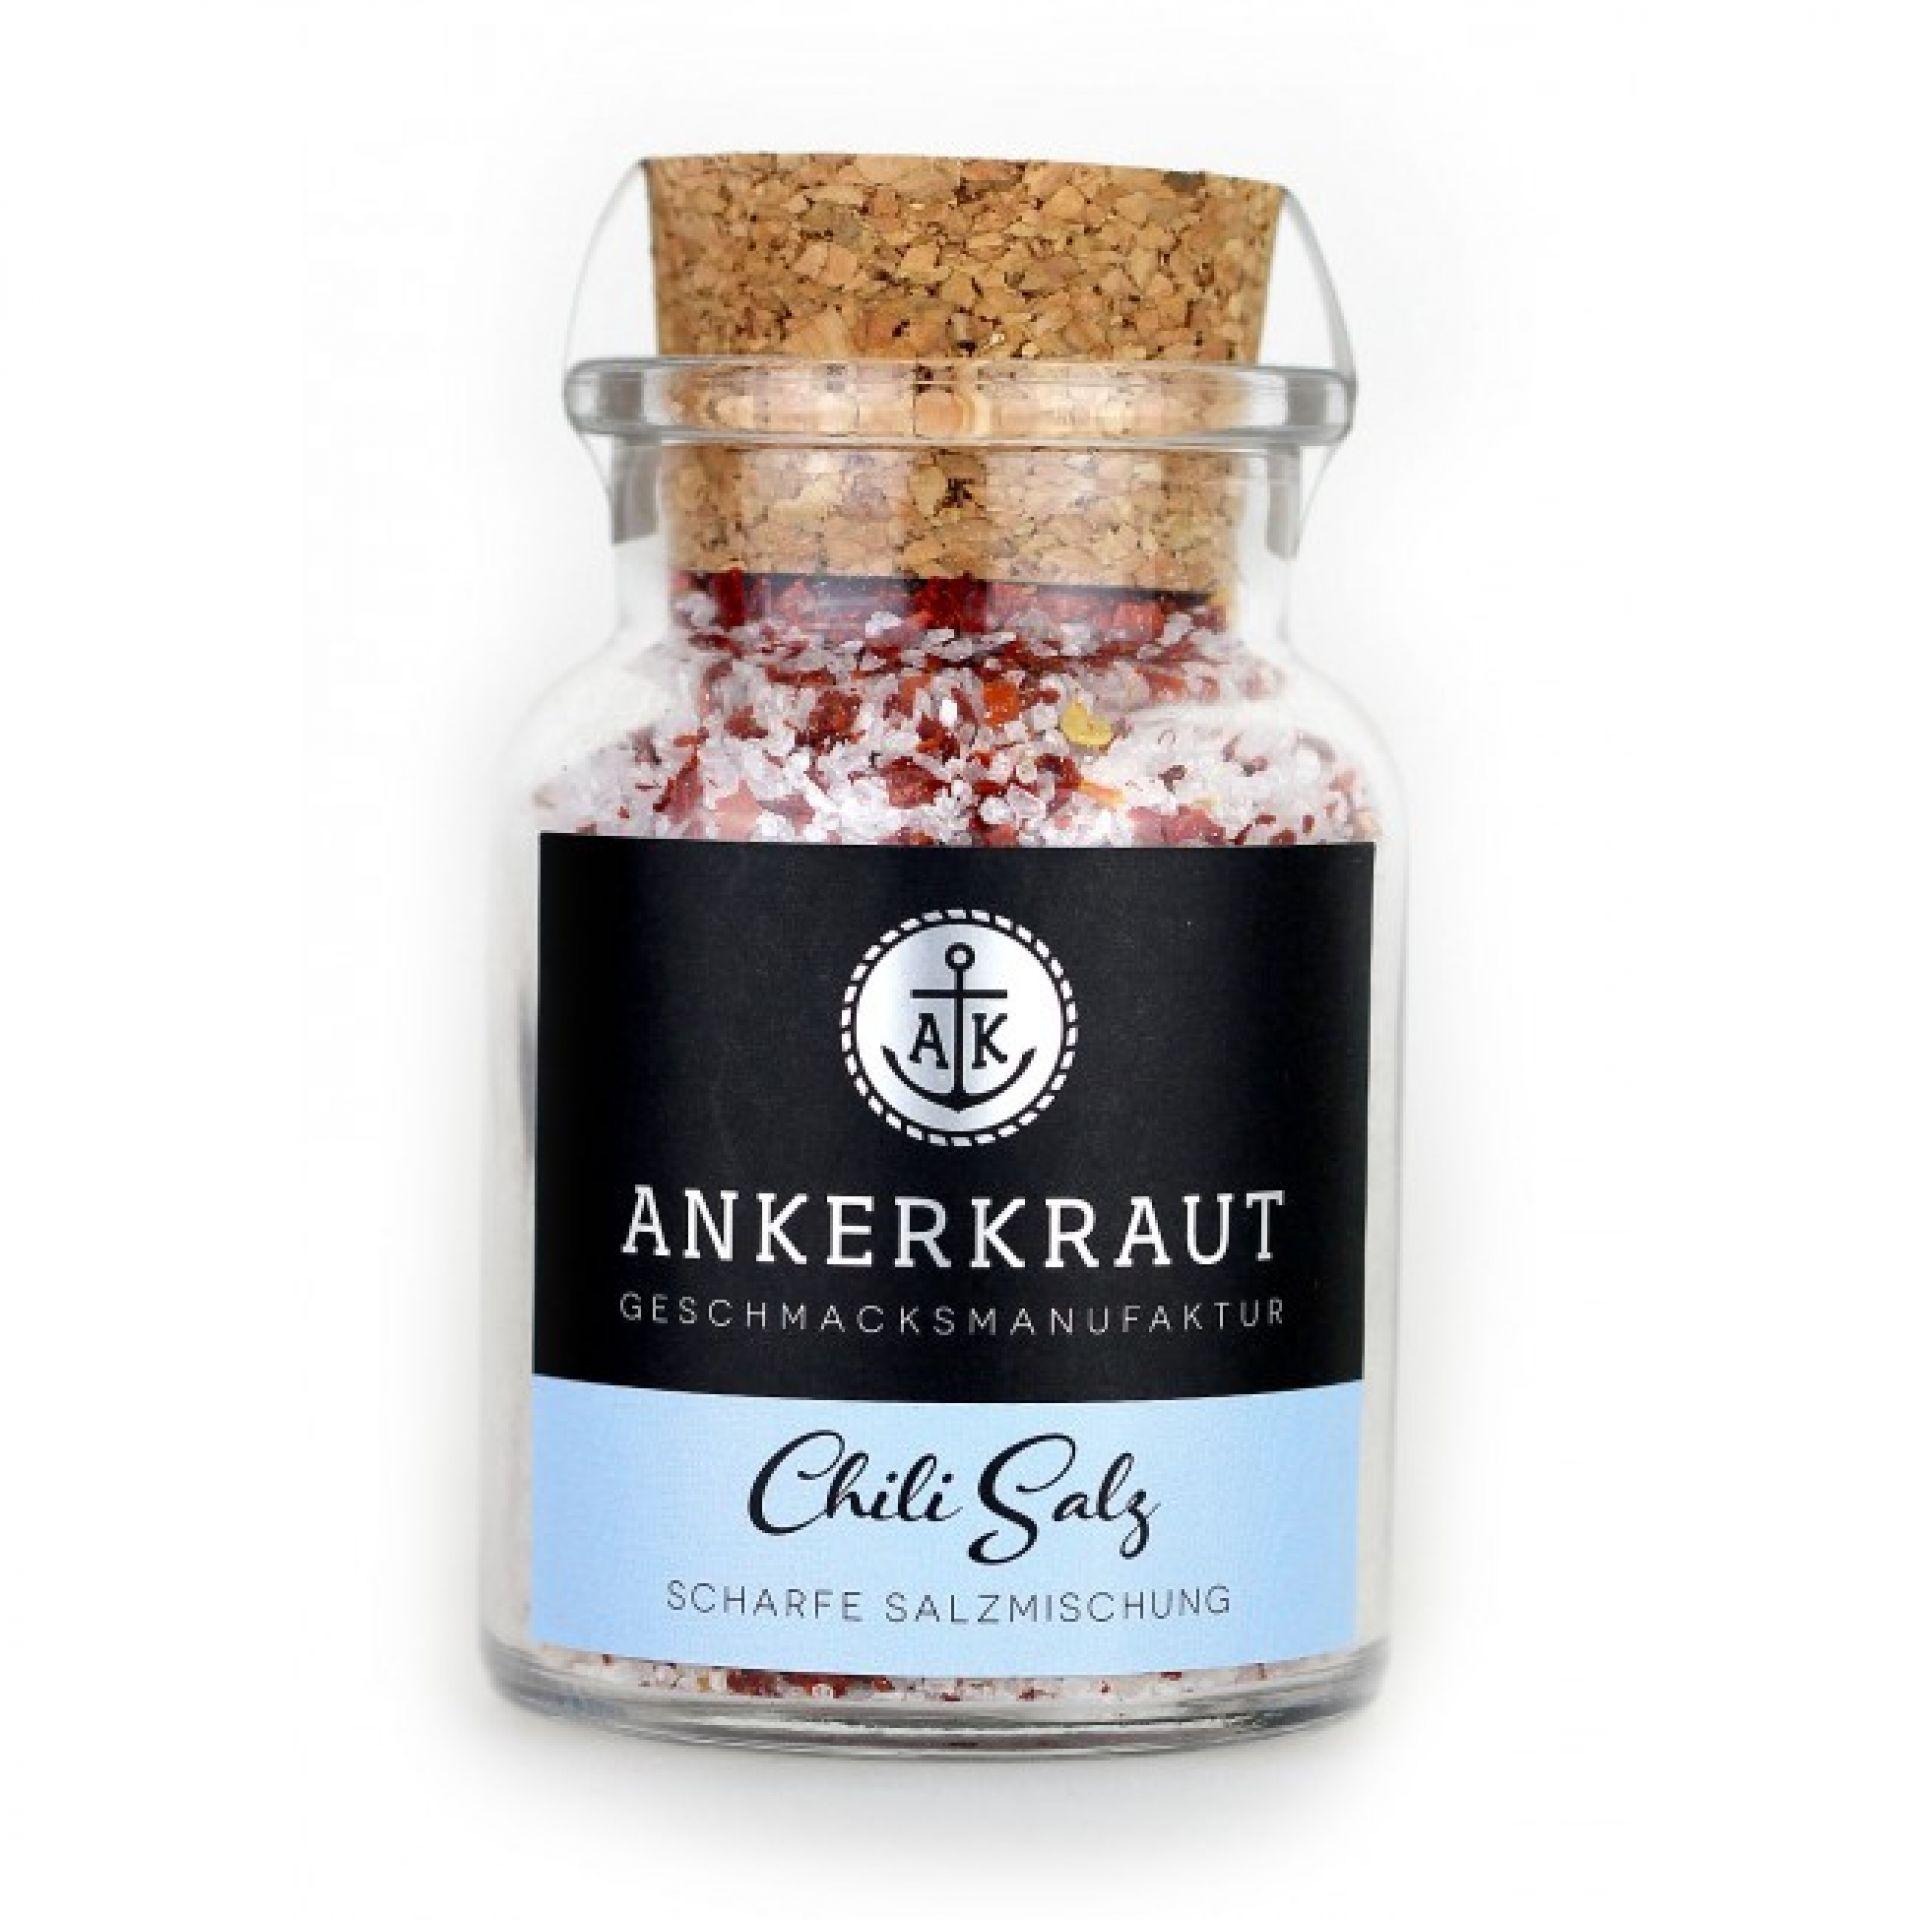 Ankerkraut Chili Salz (Korkenglas) 150 g